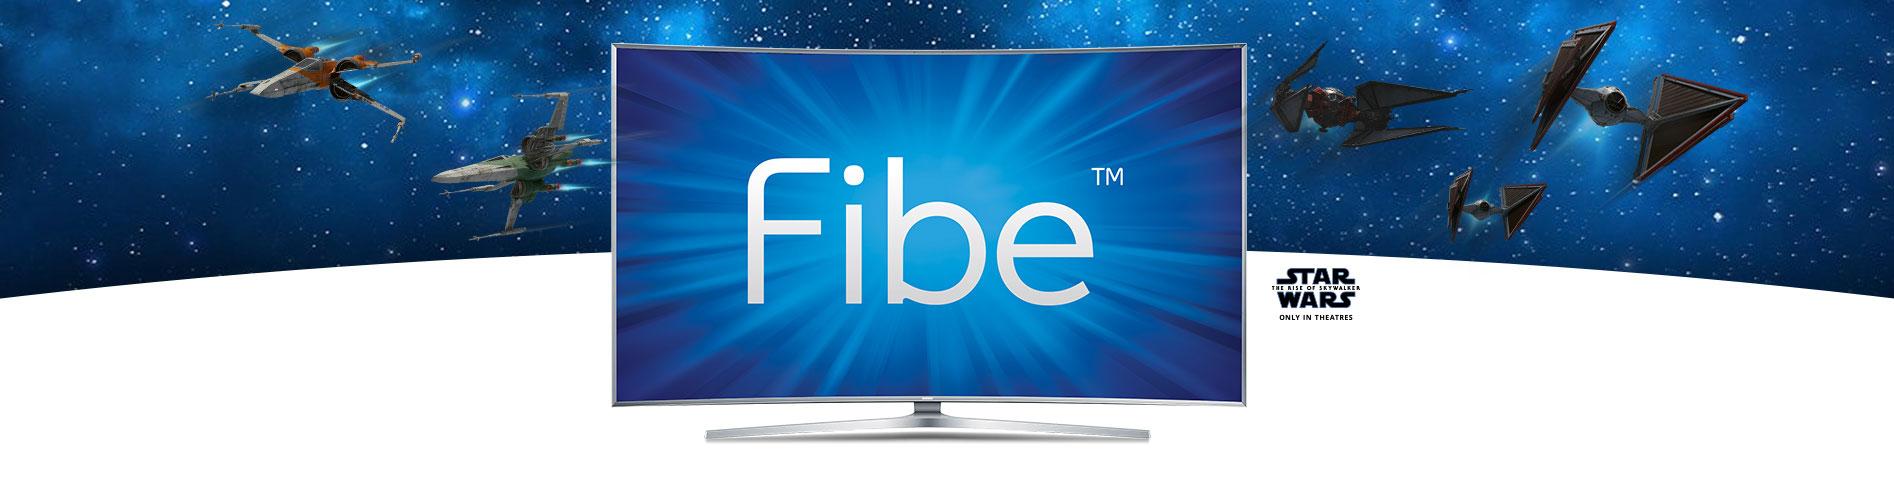 Best Tv Service >> Fibe Tv The Best Tv Service Bell Aliant